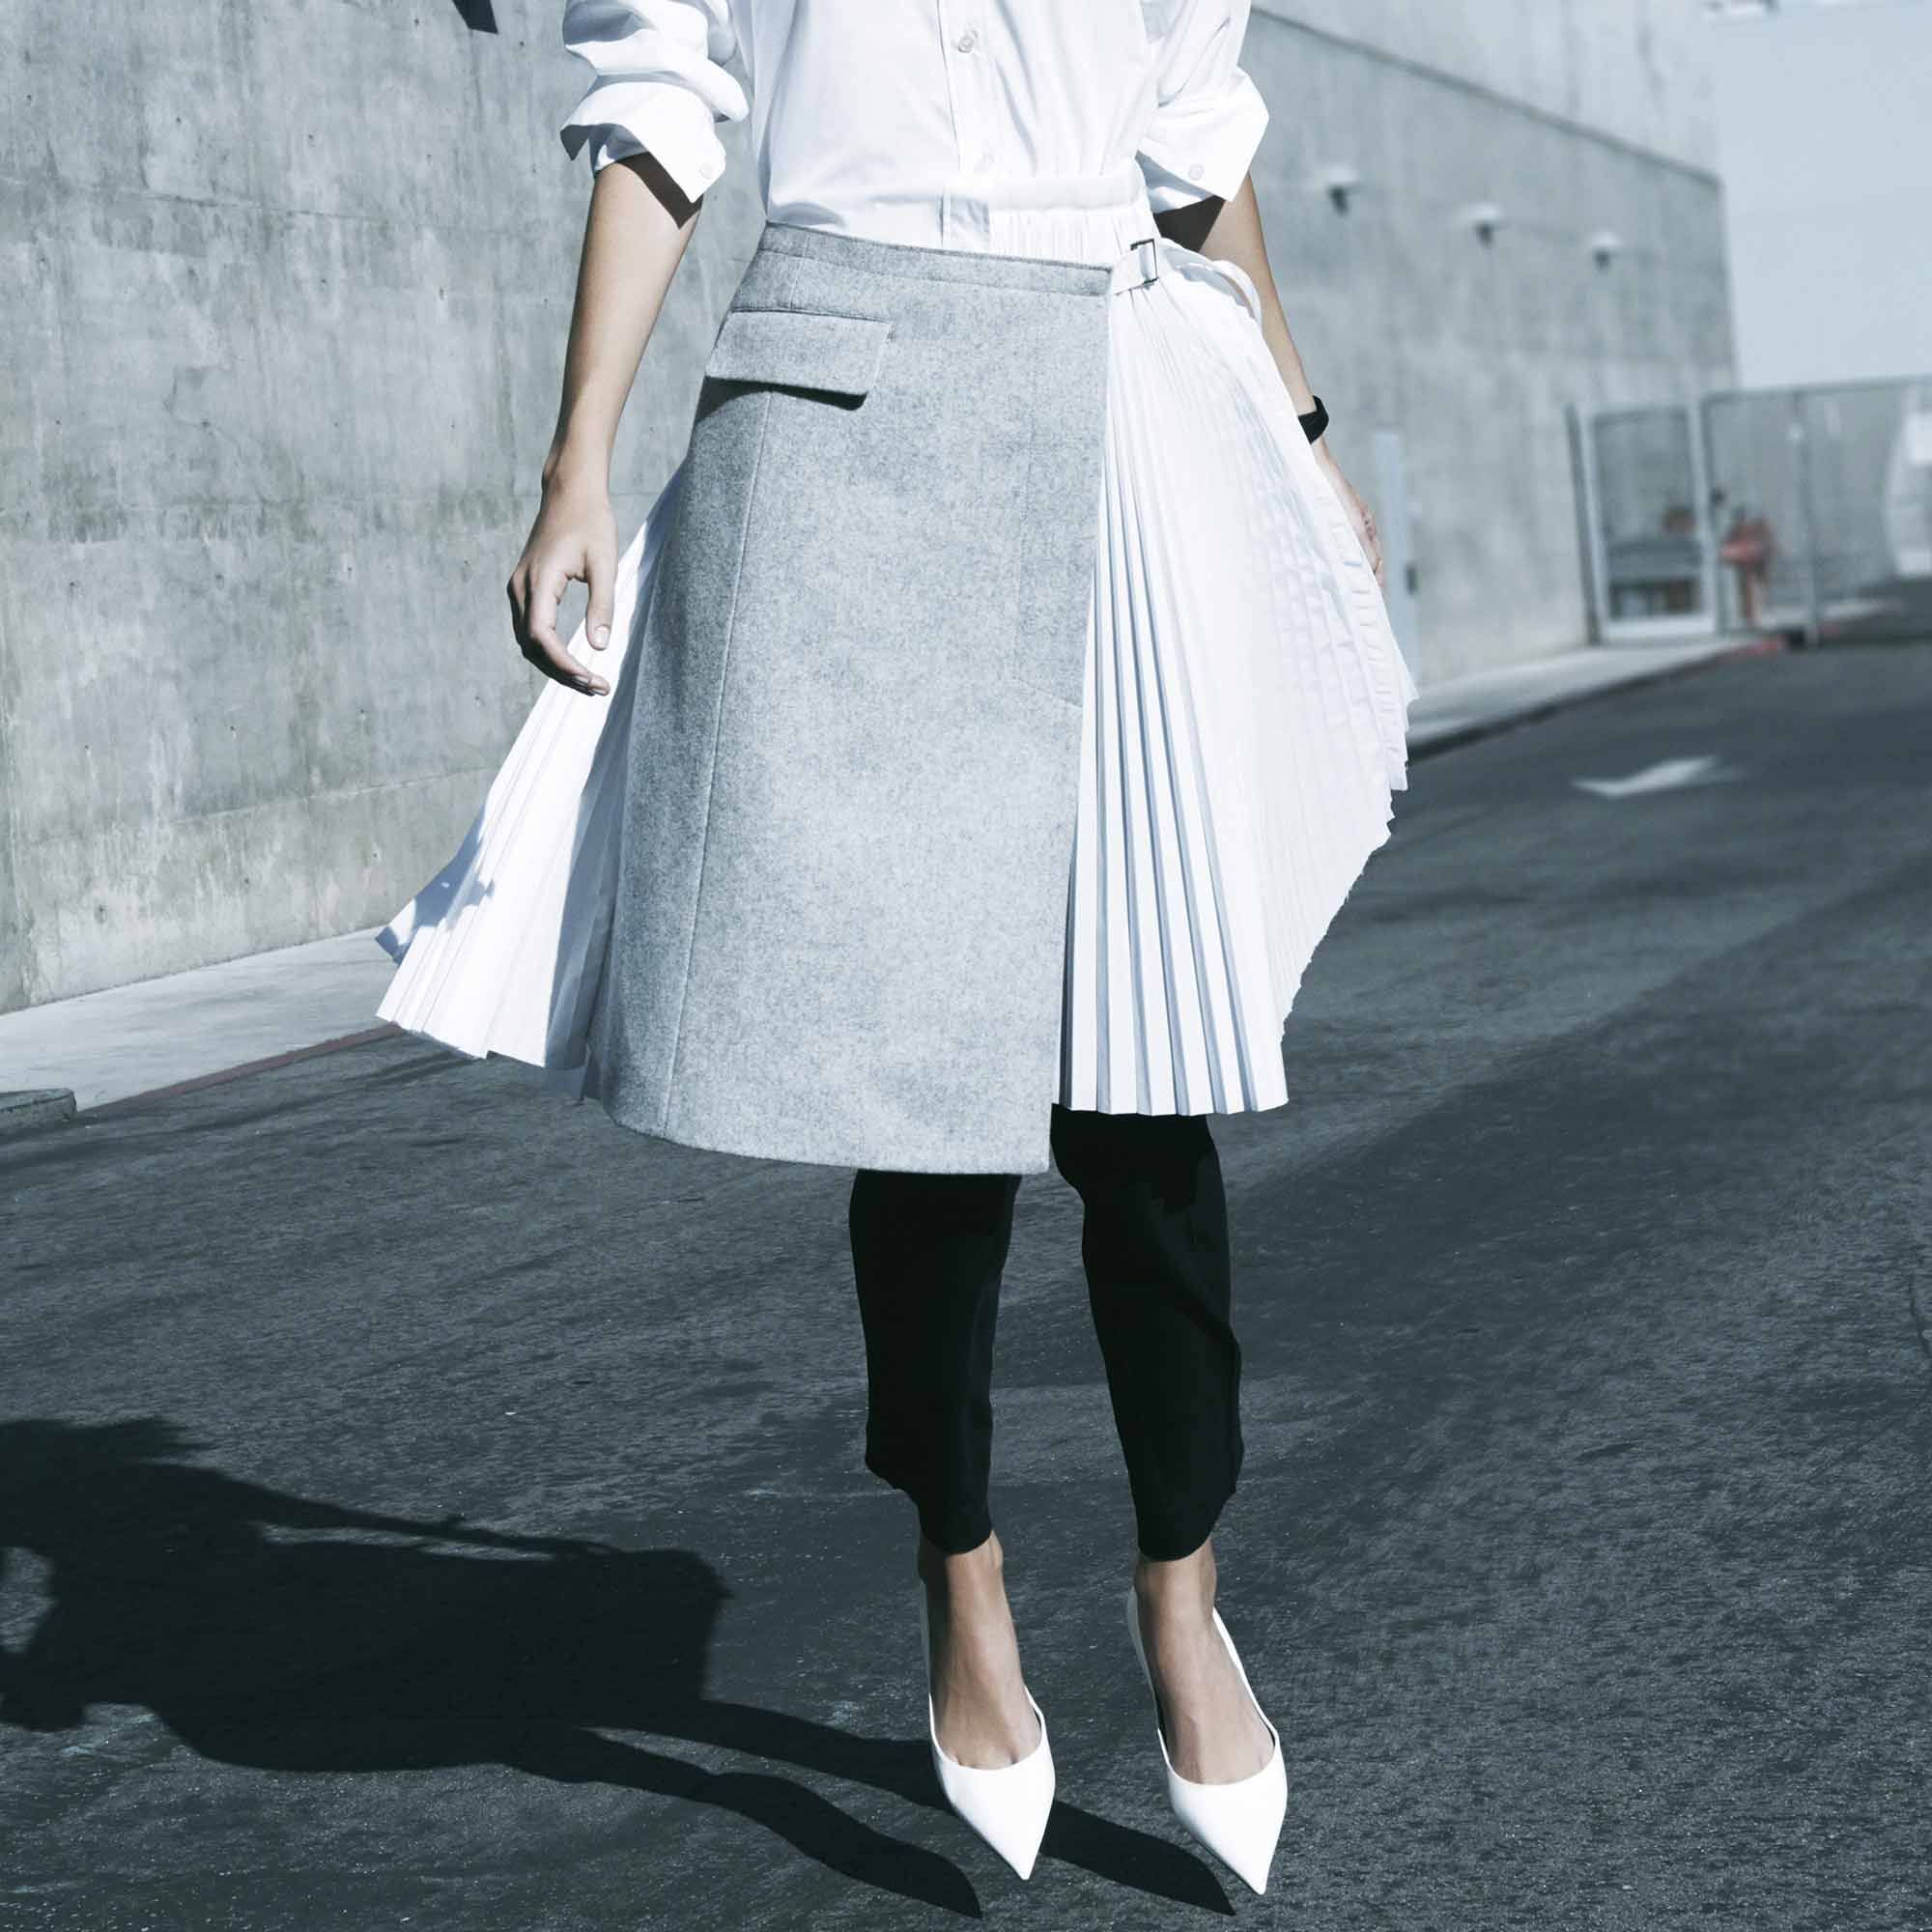 dress_yourself_better-thumb-jan-welters.jpg